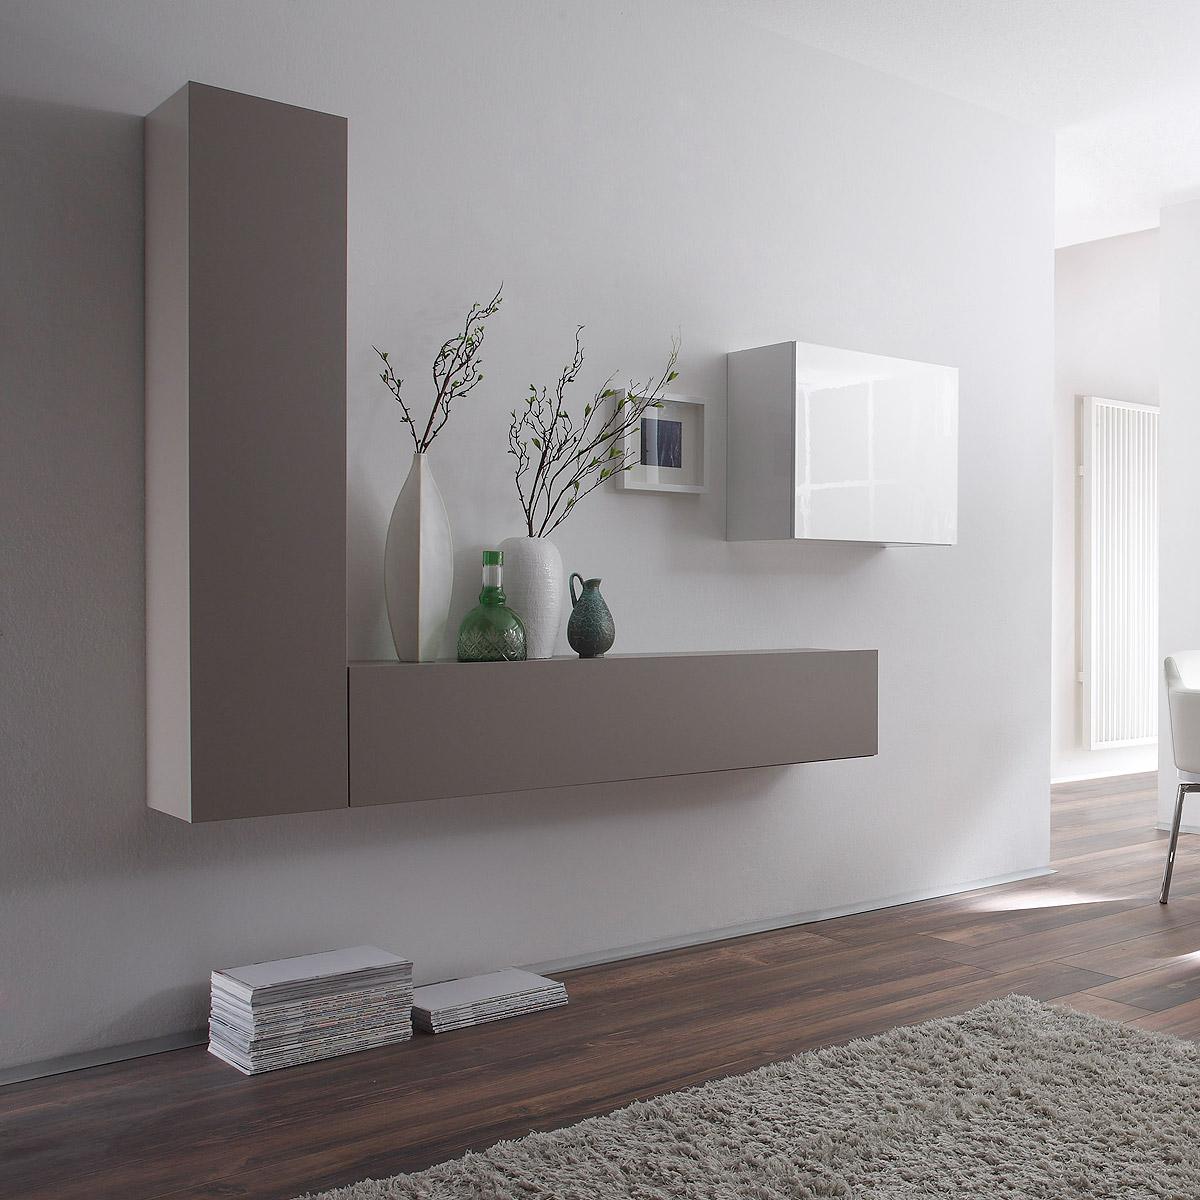 wohnwand cube kombi 6 anbauwand beige matt und wei lack. Black Bedroom Furniture Sets. Home Design Ideas